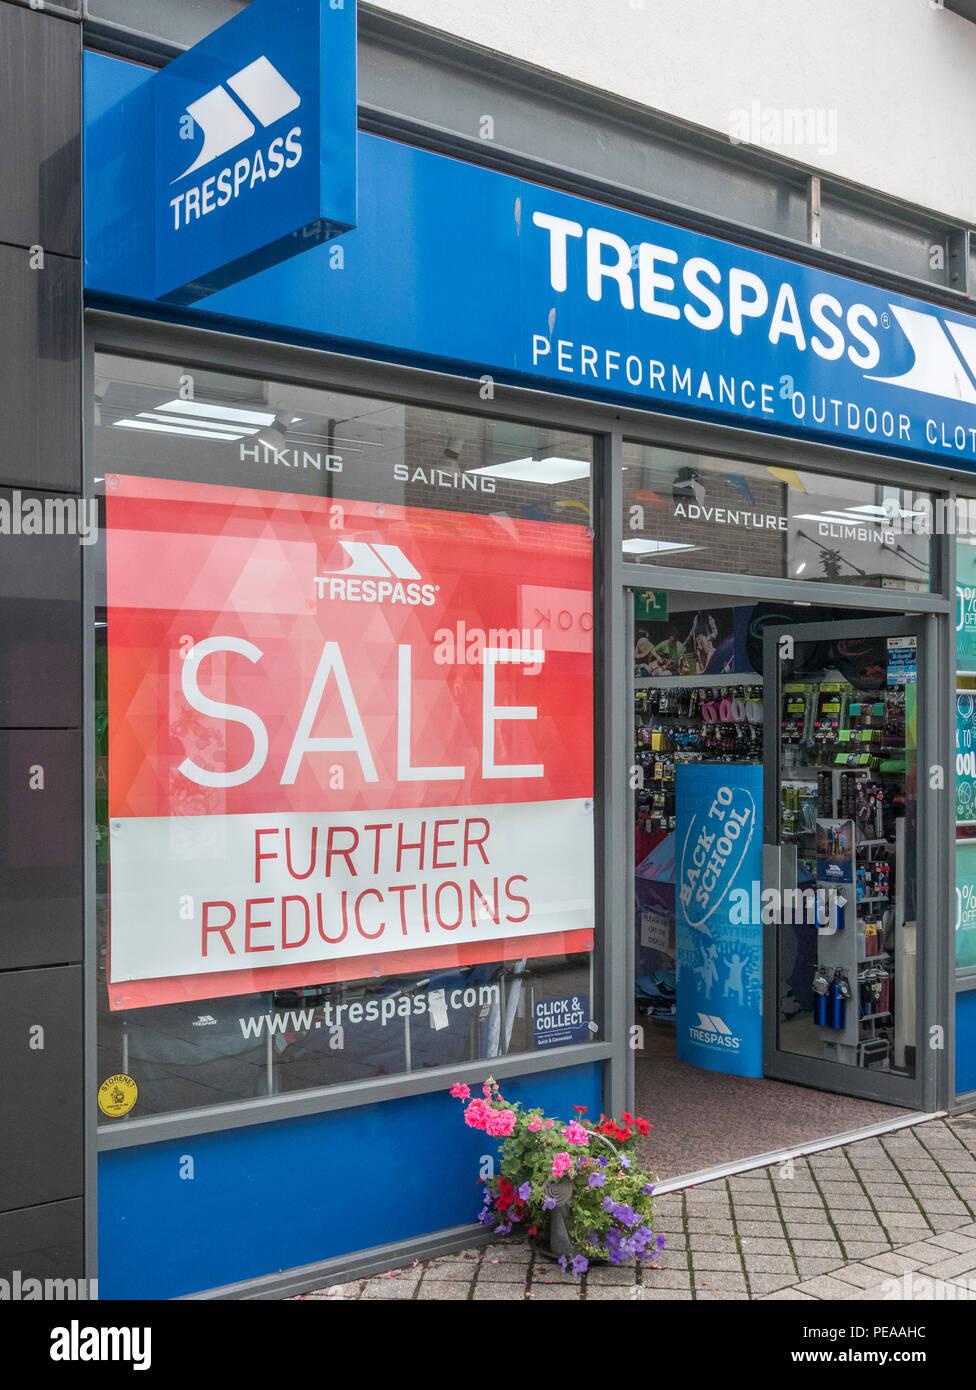 Summer sales sign in Trespass shop window (St. Austell, Cornwall). Metaphor high street squeeze. - Stock Image